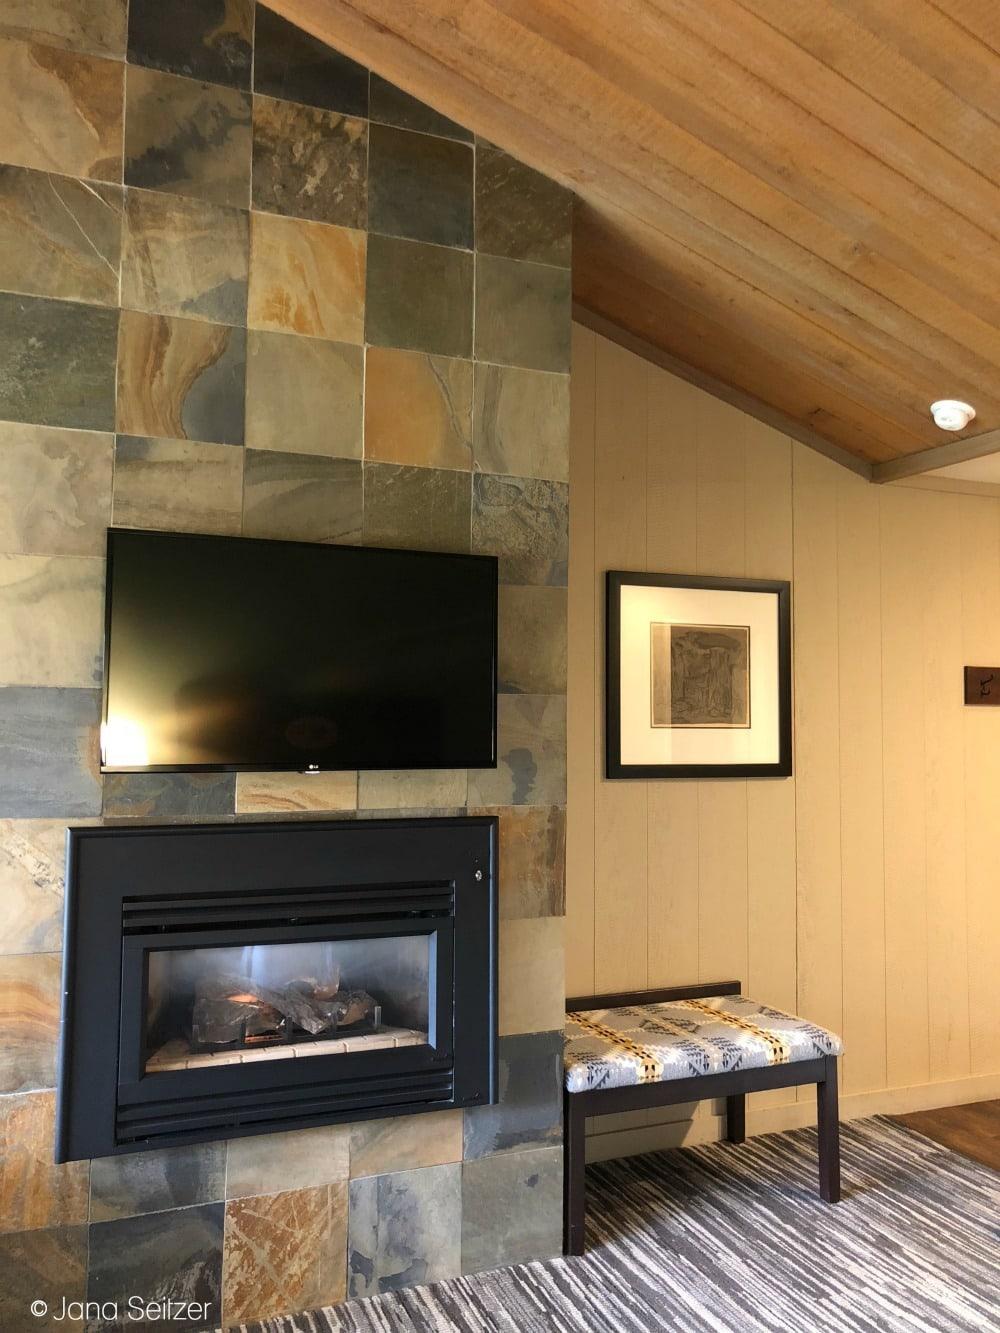 Salishan Resort room with fireplace